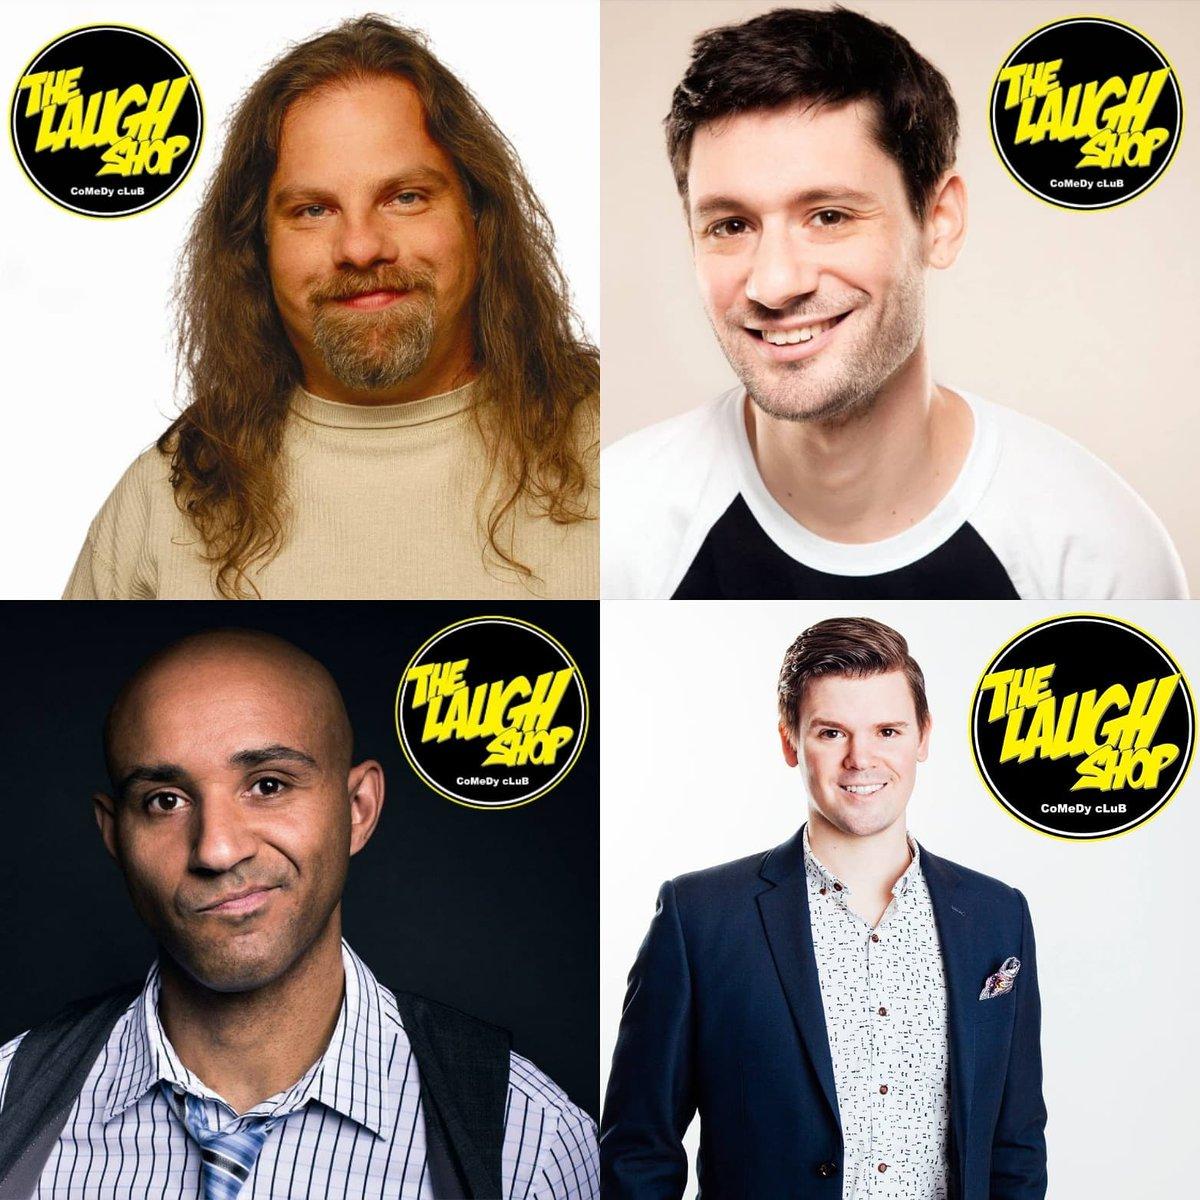 Upcoming Shows!! @Tim_Nutt_Comic Aug 16-18; @Adam_Newman Aug 23-25; @Trent_McClellan Aug 30 - Sep 1; Juno Award Winning @ivandecker Sep 6-8! Get your tickets NOW:  http://www. laughshopcalgary.com  &nbsp;   #yyc #yyccomedy #yycevents <br>http://pic.twitter.com/9jDT9eQ4D4